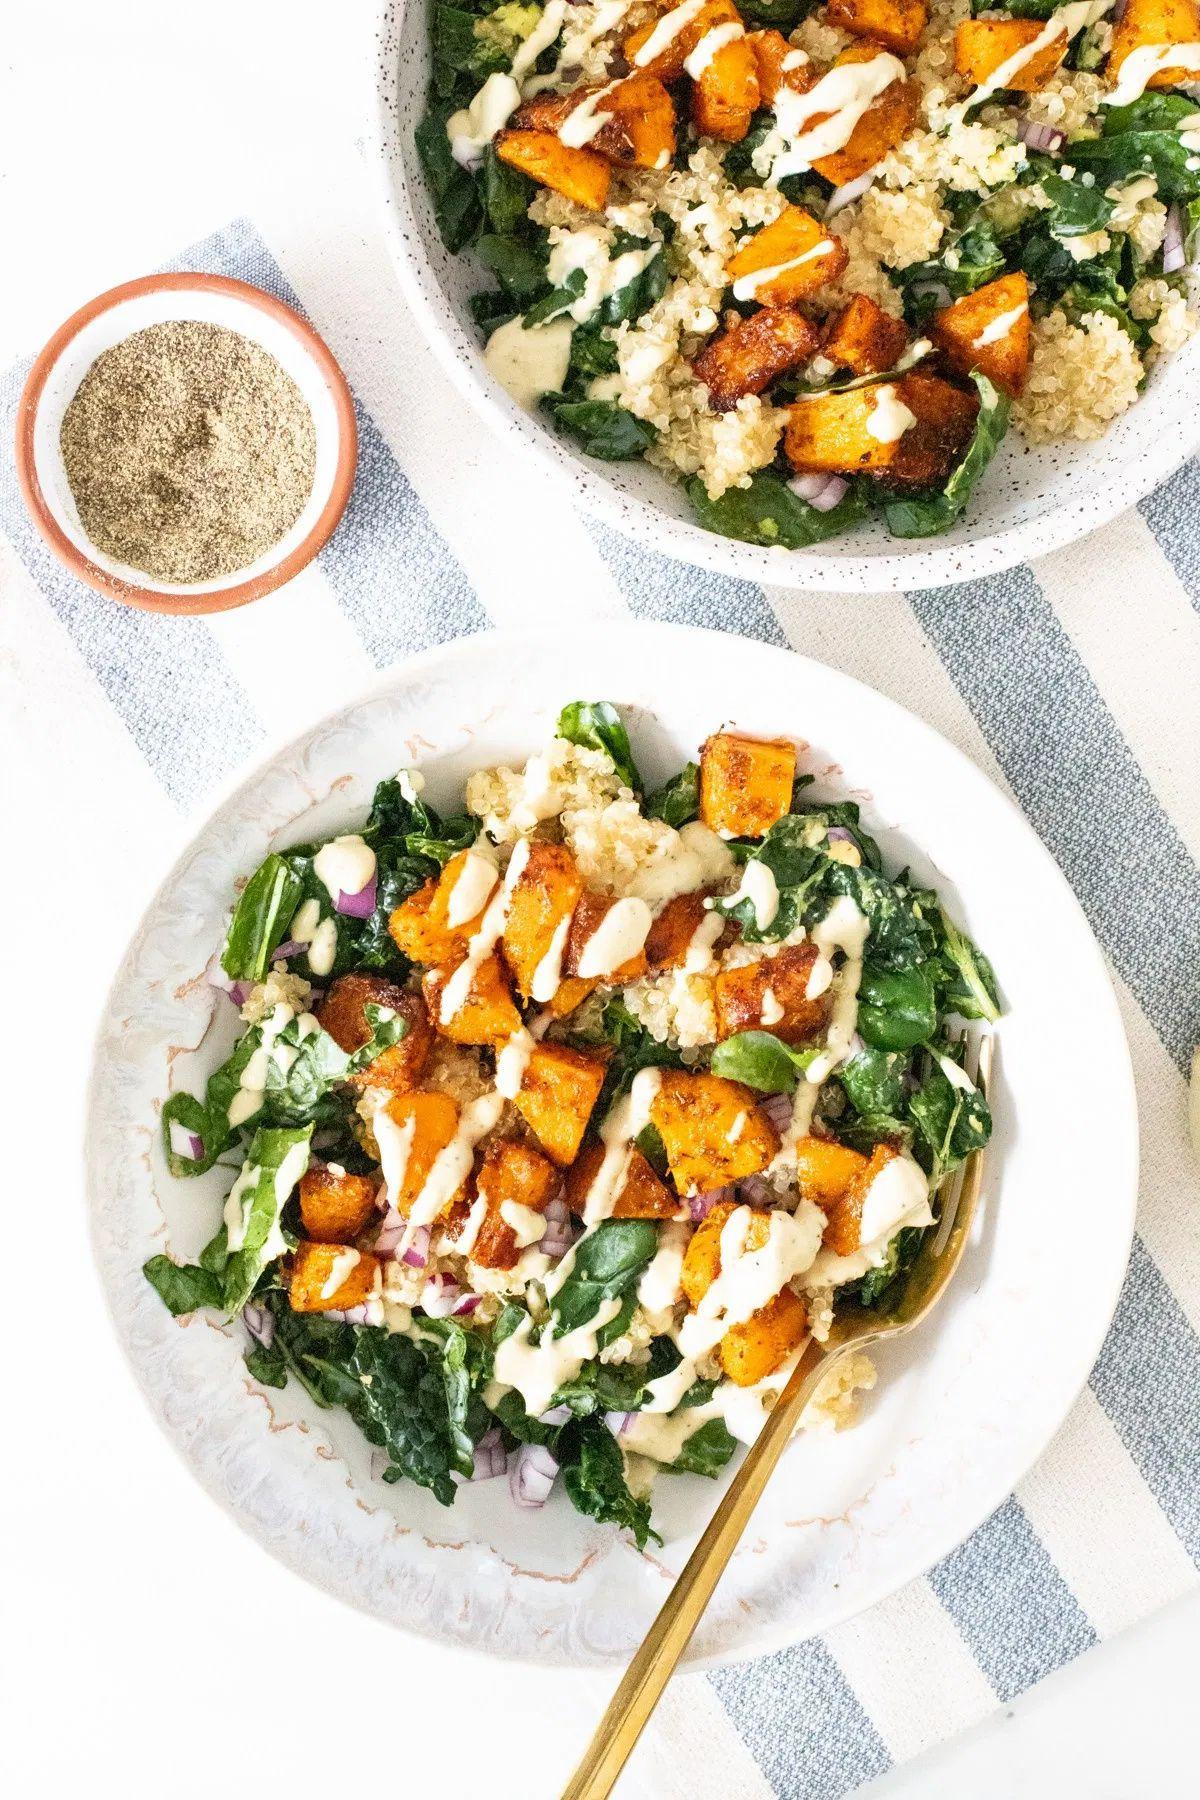 Butternut Squash Quinoa Bowls This Savory Vegan Recipe In 2020 Savory Vegan Vegan Dinner Plan Butternut Squash Quinoa